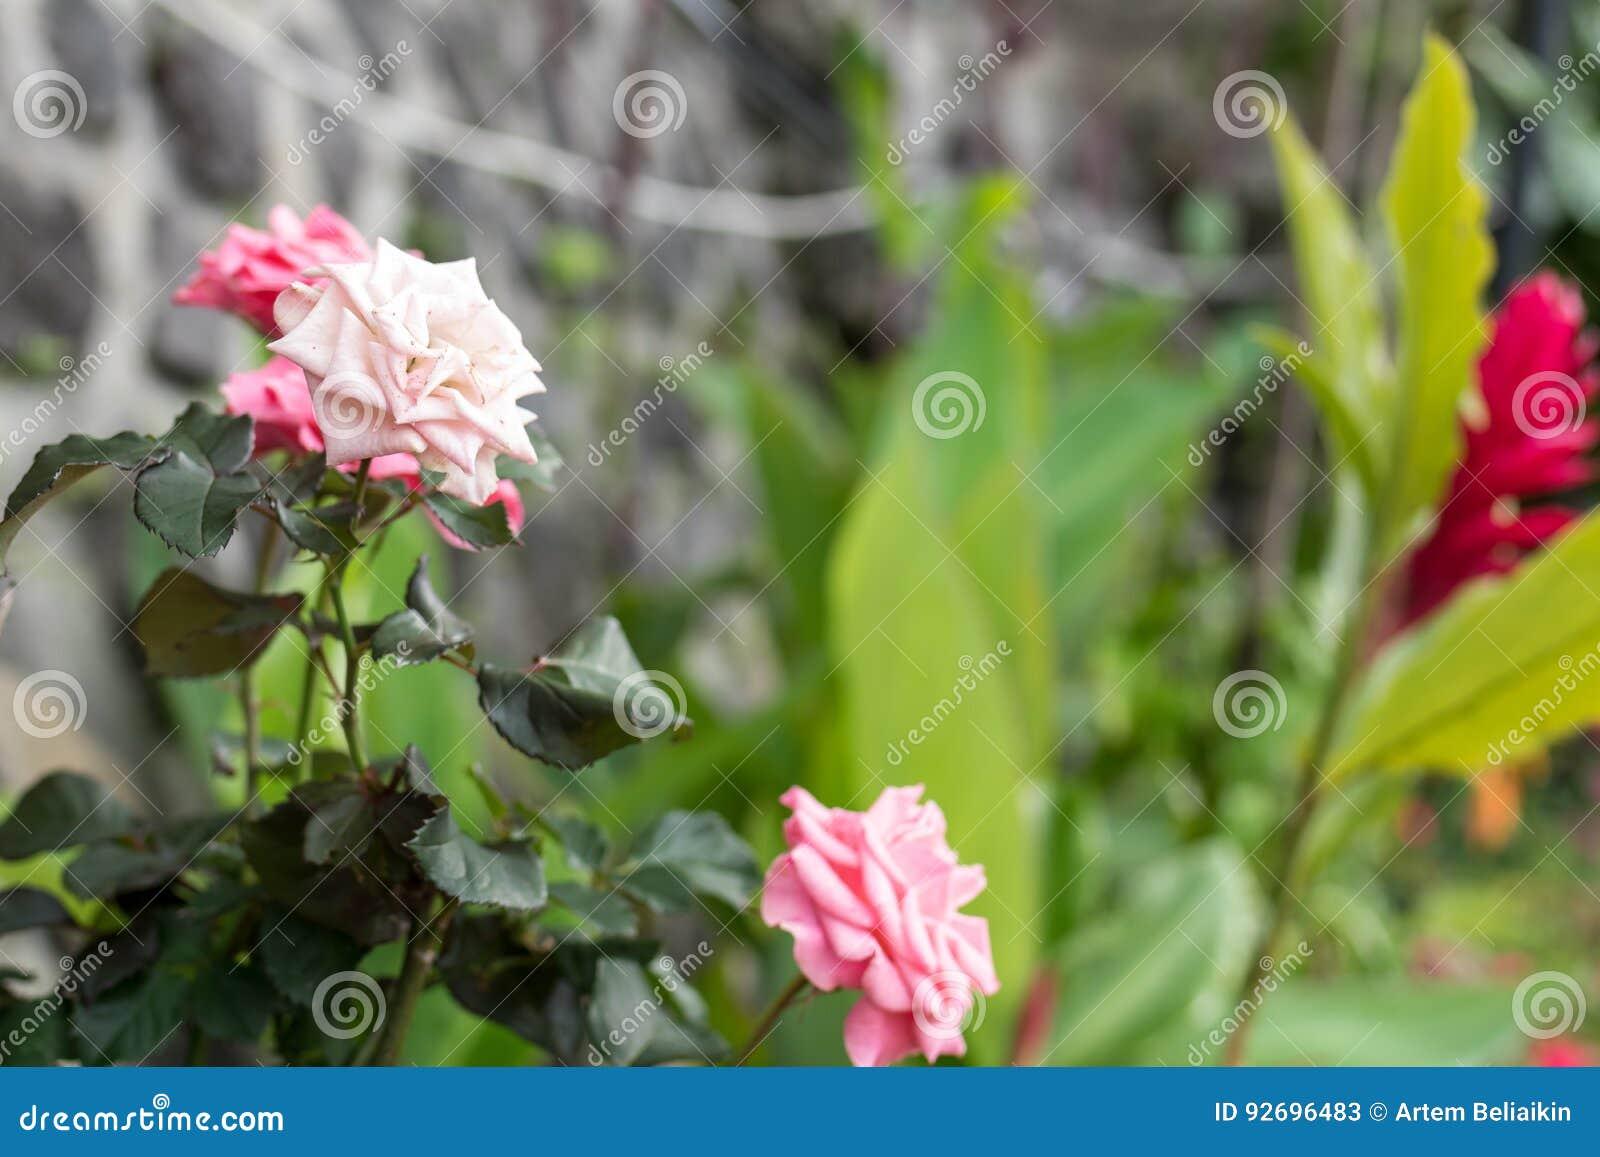 Beautiful tropical flower background on bali island indonesia download beautiful tropical flower background on bali island indonesia close up of flowers izmirmasajfo